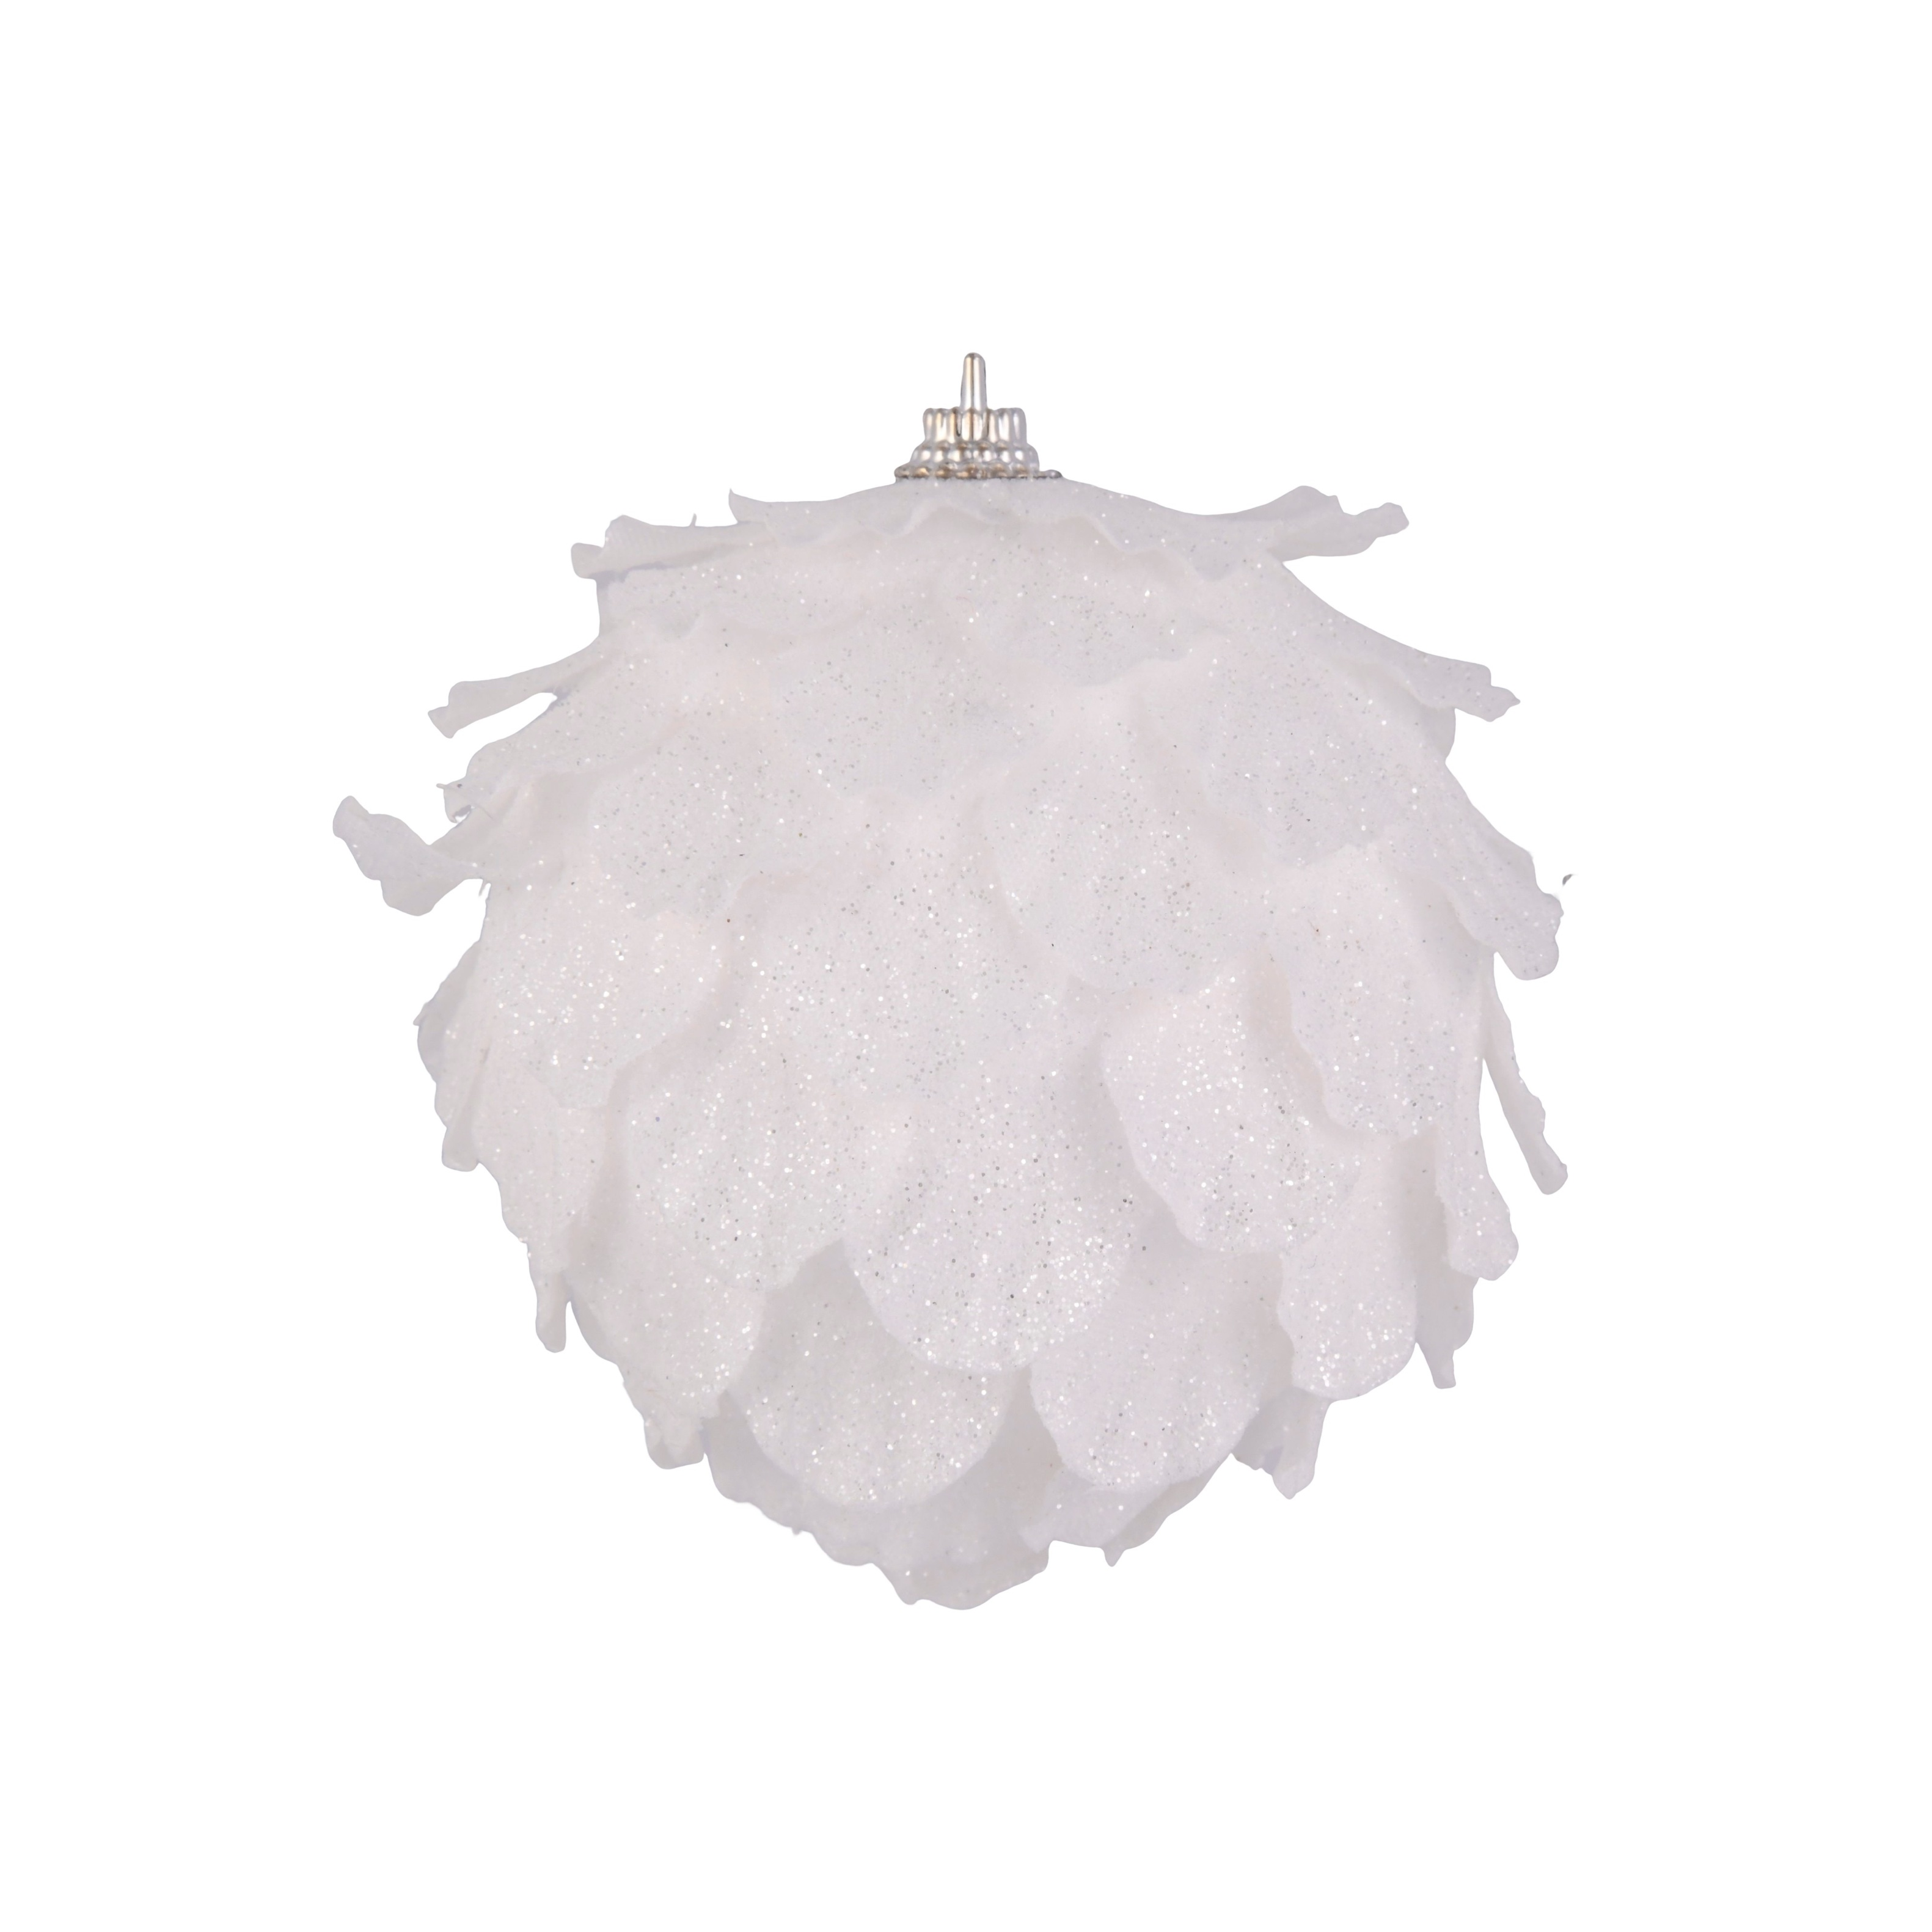 4in White Sparkly Pine Ornament